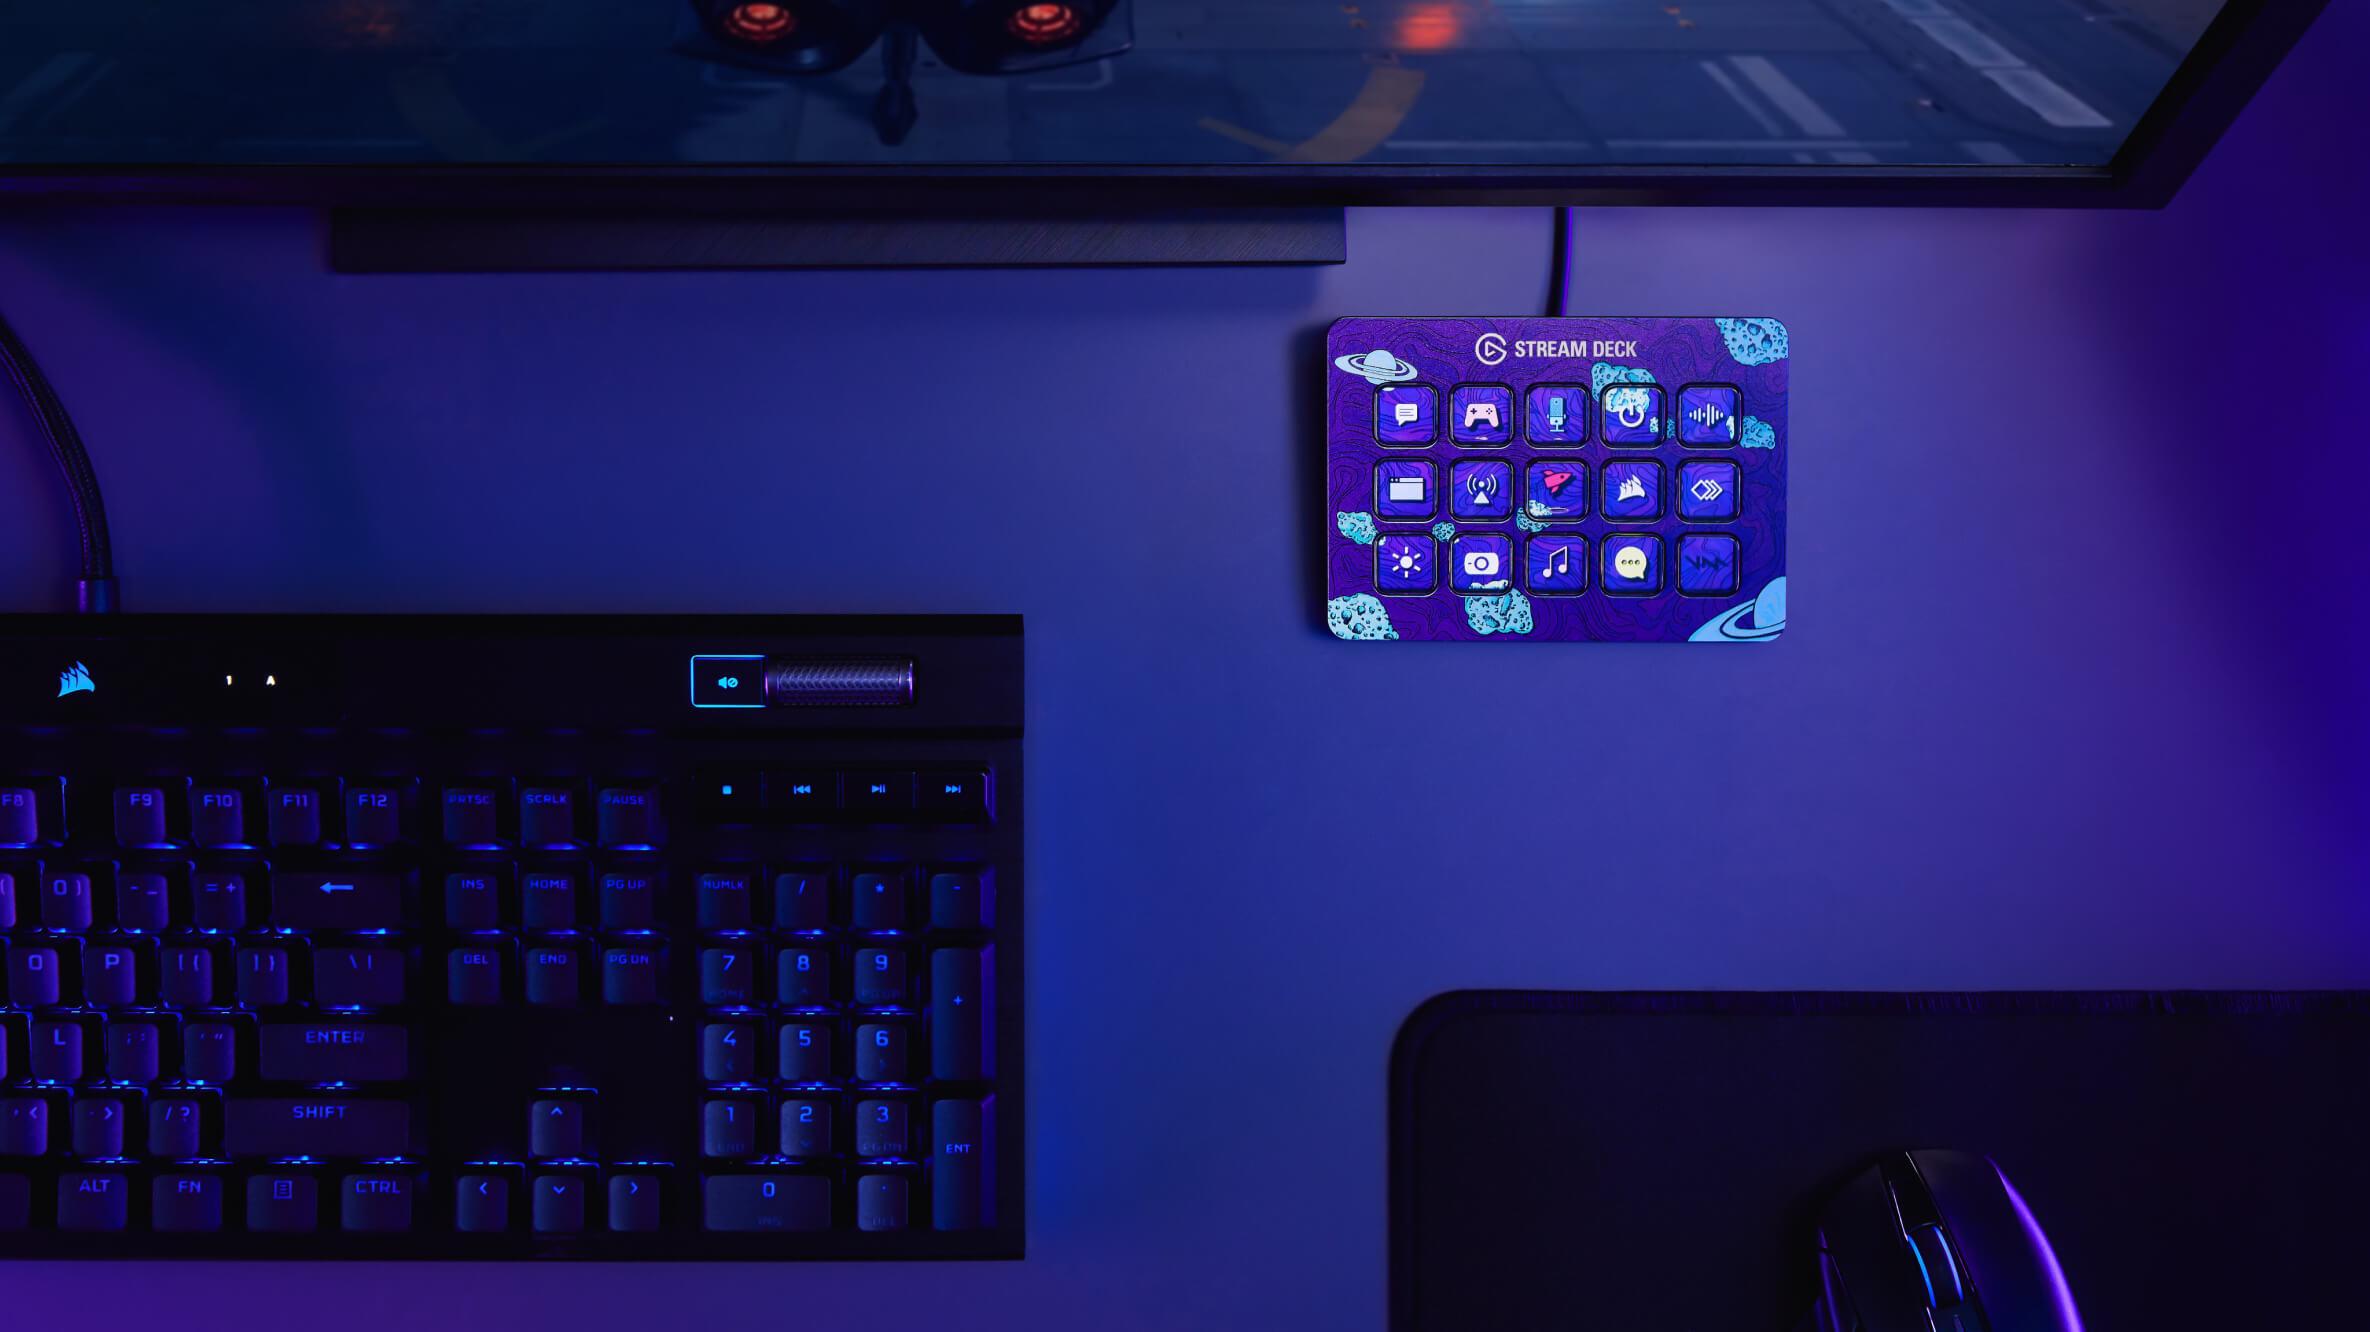 Elgato Stream Deck MK.2 interface has 15 customizable LCD keys, faceplates, and FX